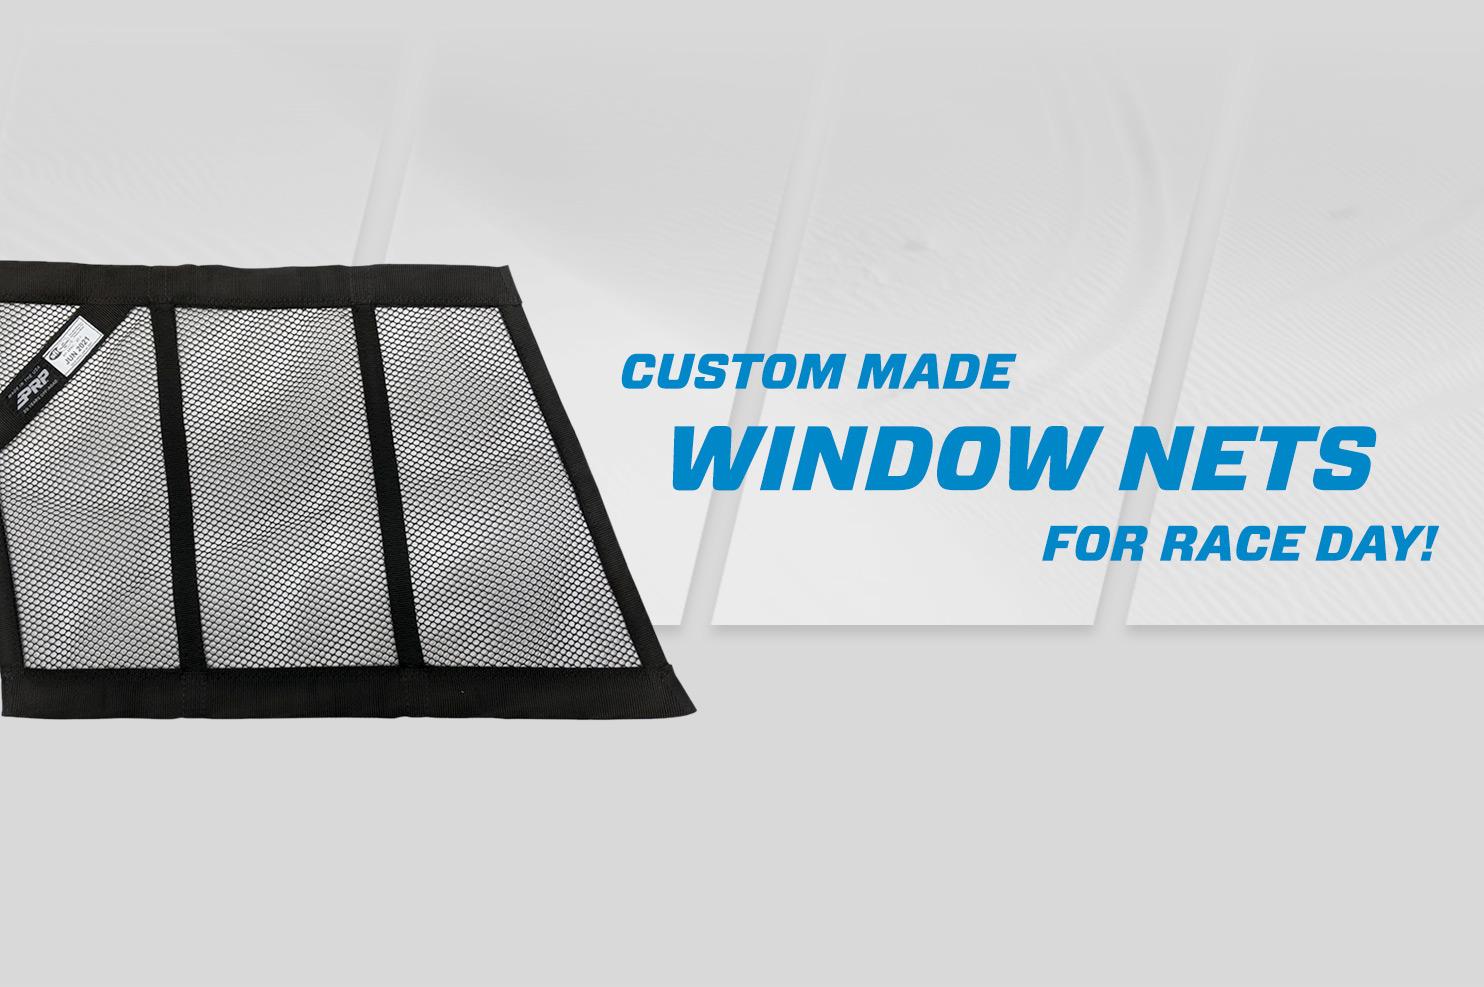 Window nets on prp speed grey background